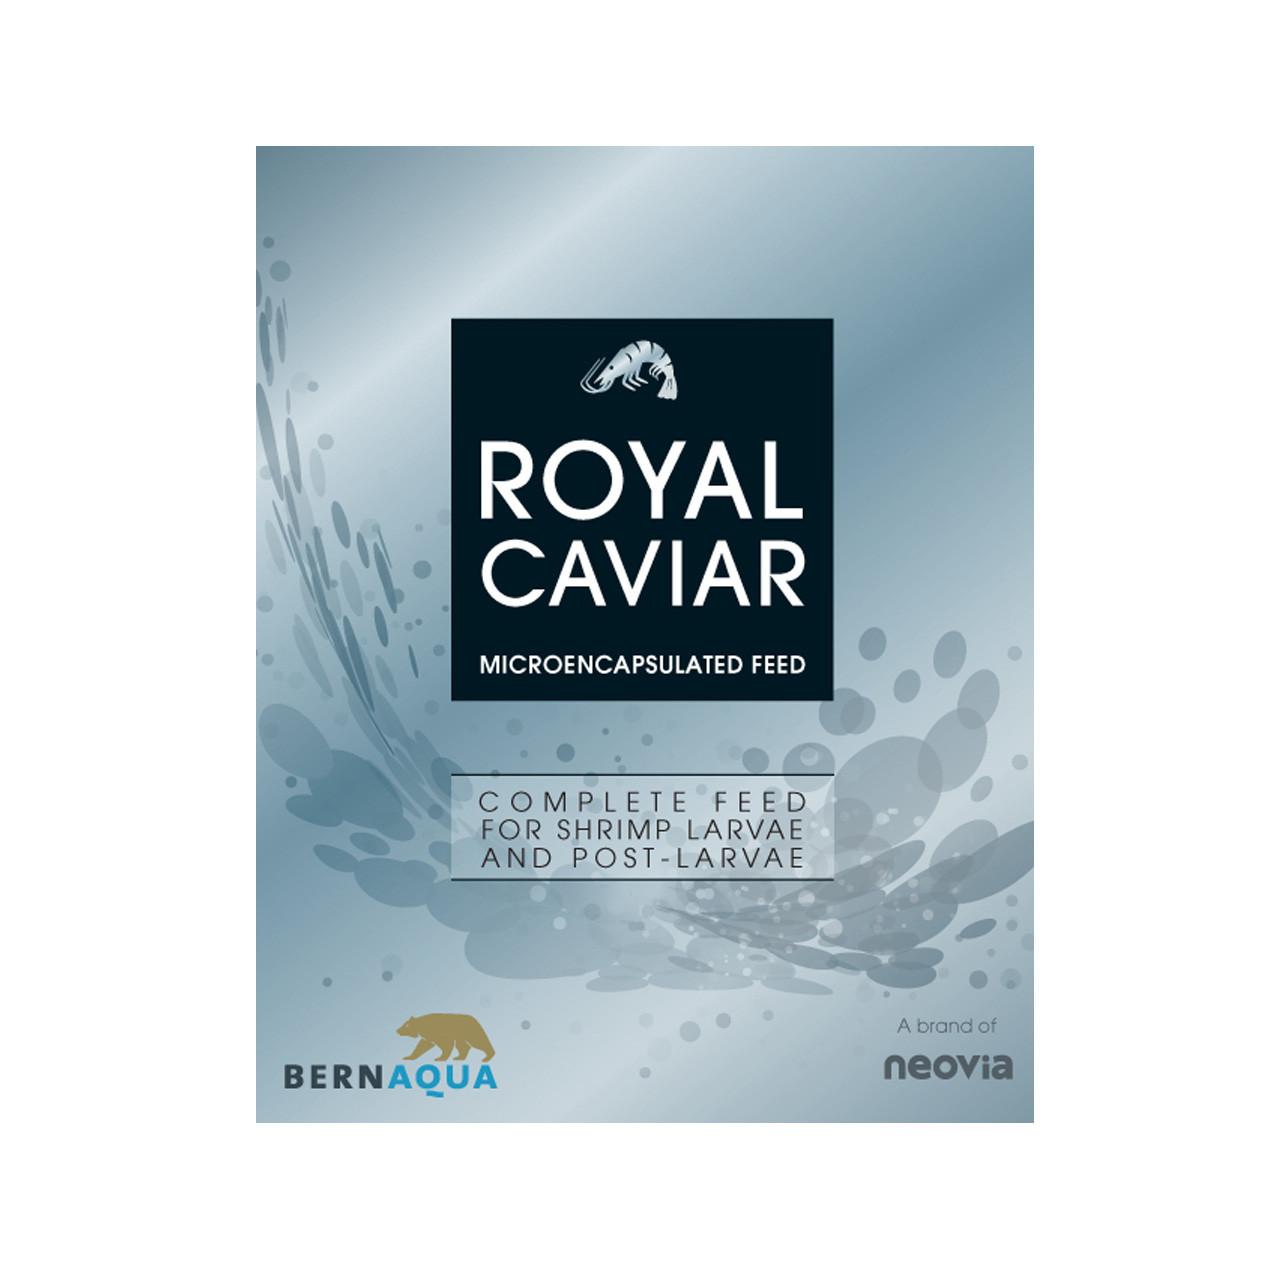 Royal Caviar dieta para larvas de camarón BernAqua